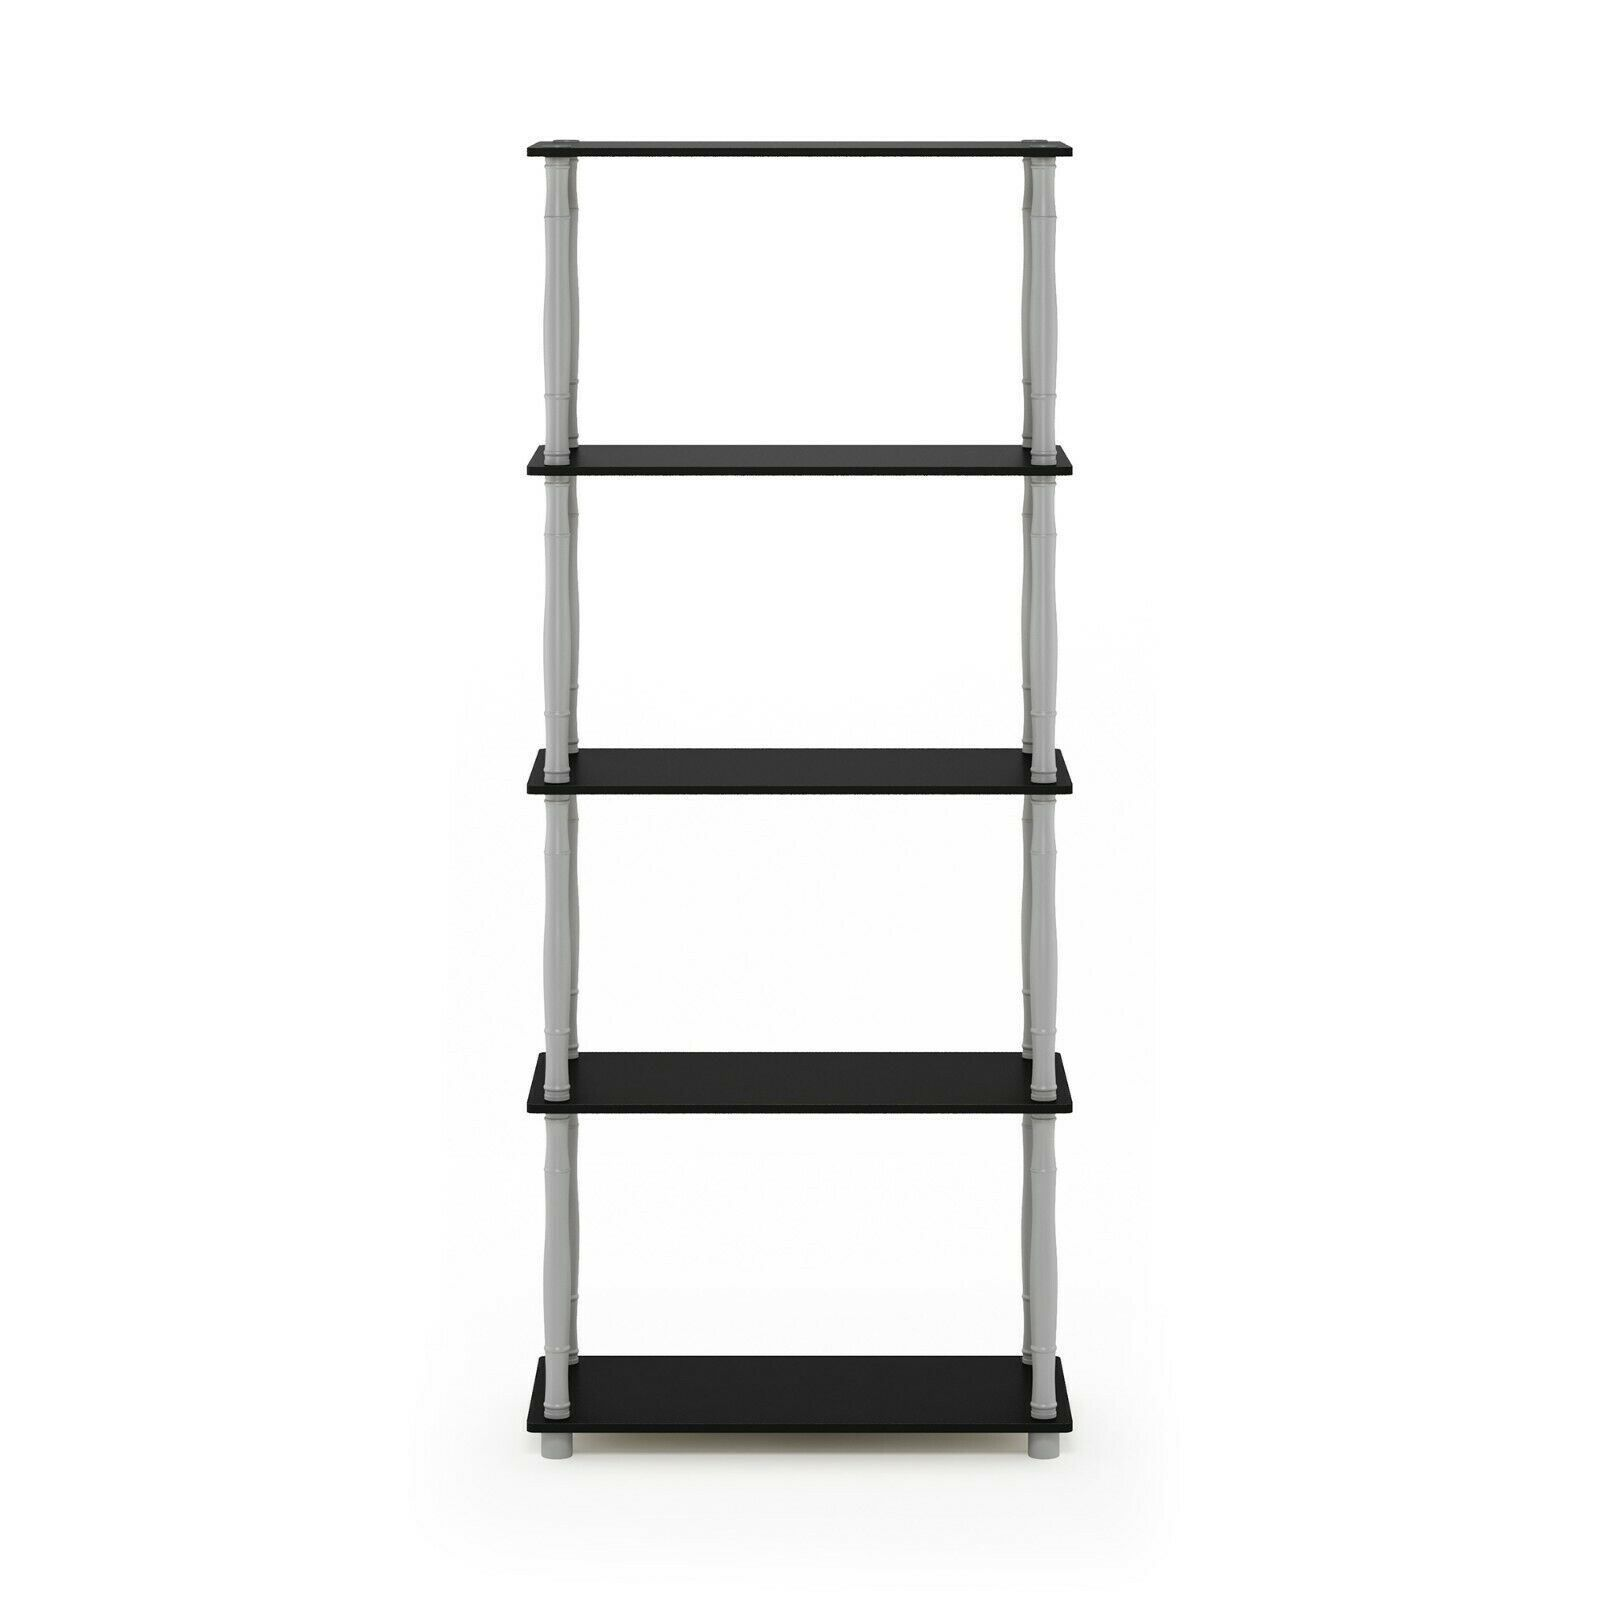 Furinno Turn-N-Tube 5-Tier Multipurpose Shelf Display Rack with Classic Tubes, Black/Grey